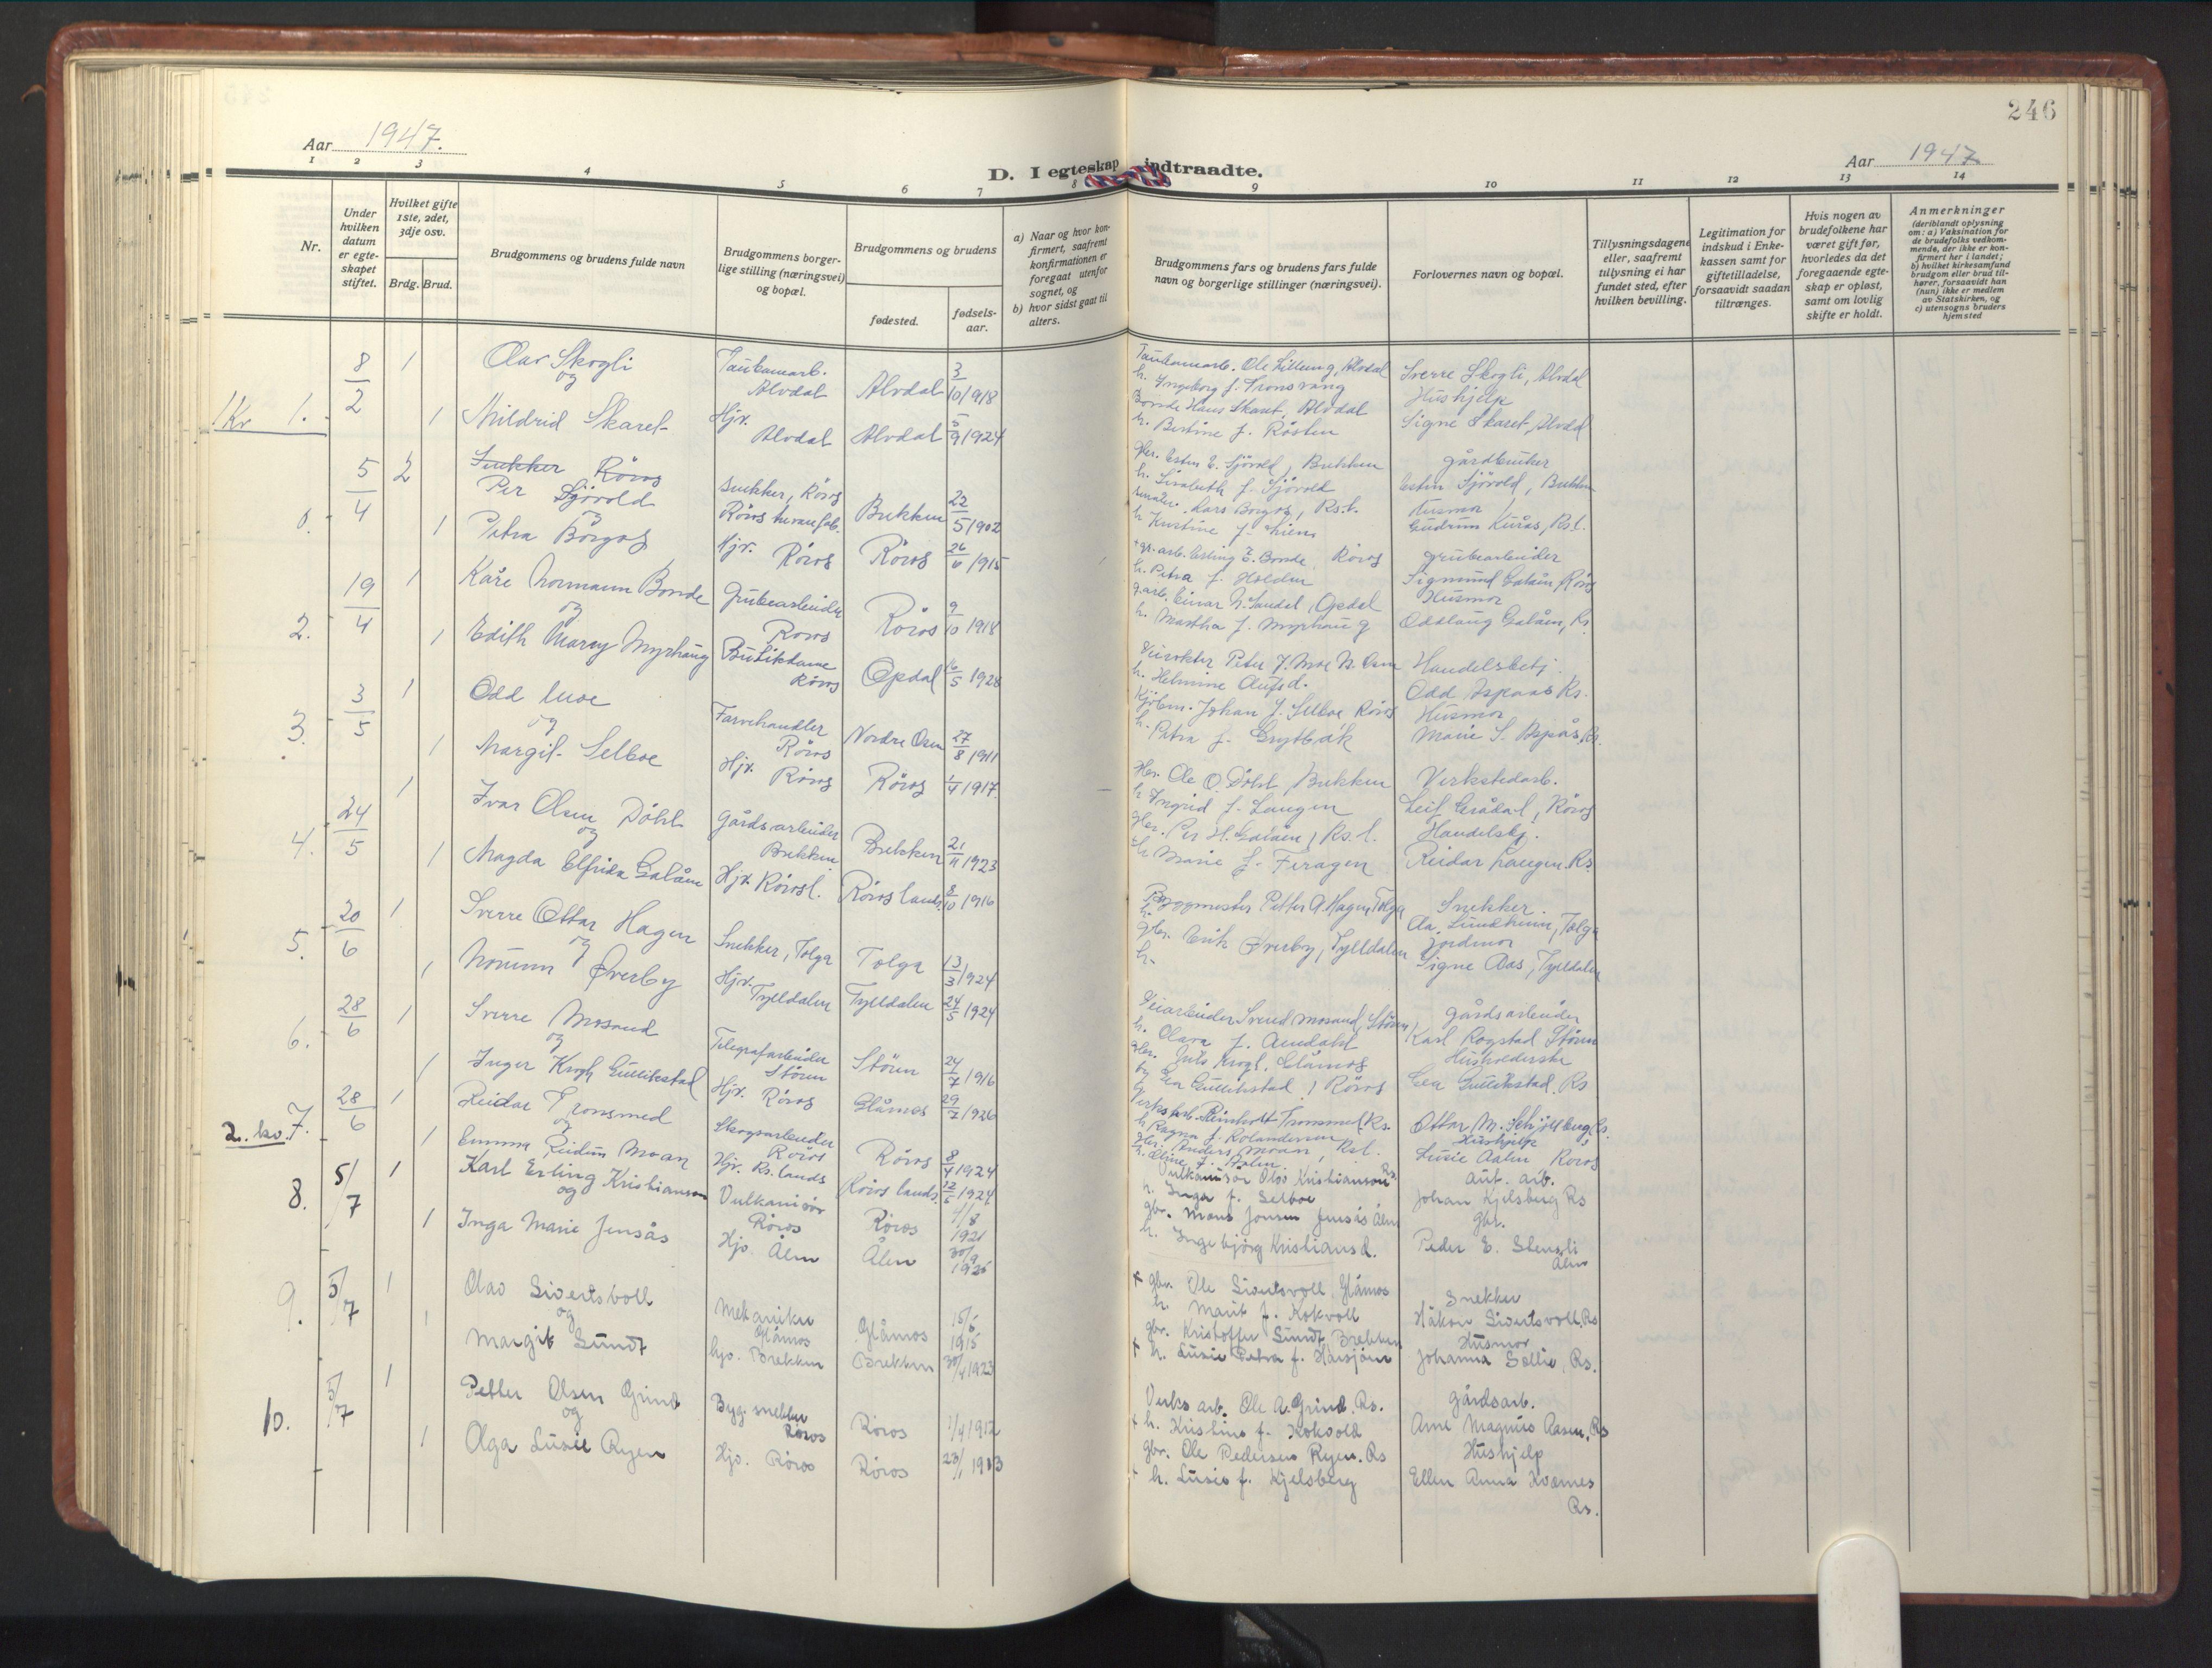 SAT, Ministerialprotokoller, klokkerbøker og fødselsregistre - Sør-Trøndelag, 681/L0943: Parish register (copy) no. 681C07, 1926-1954, p. 246